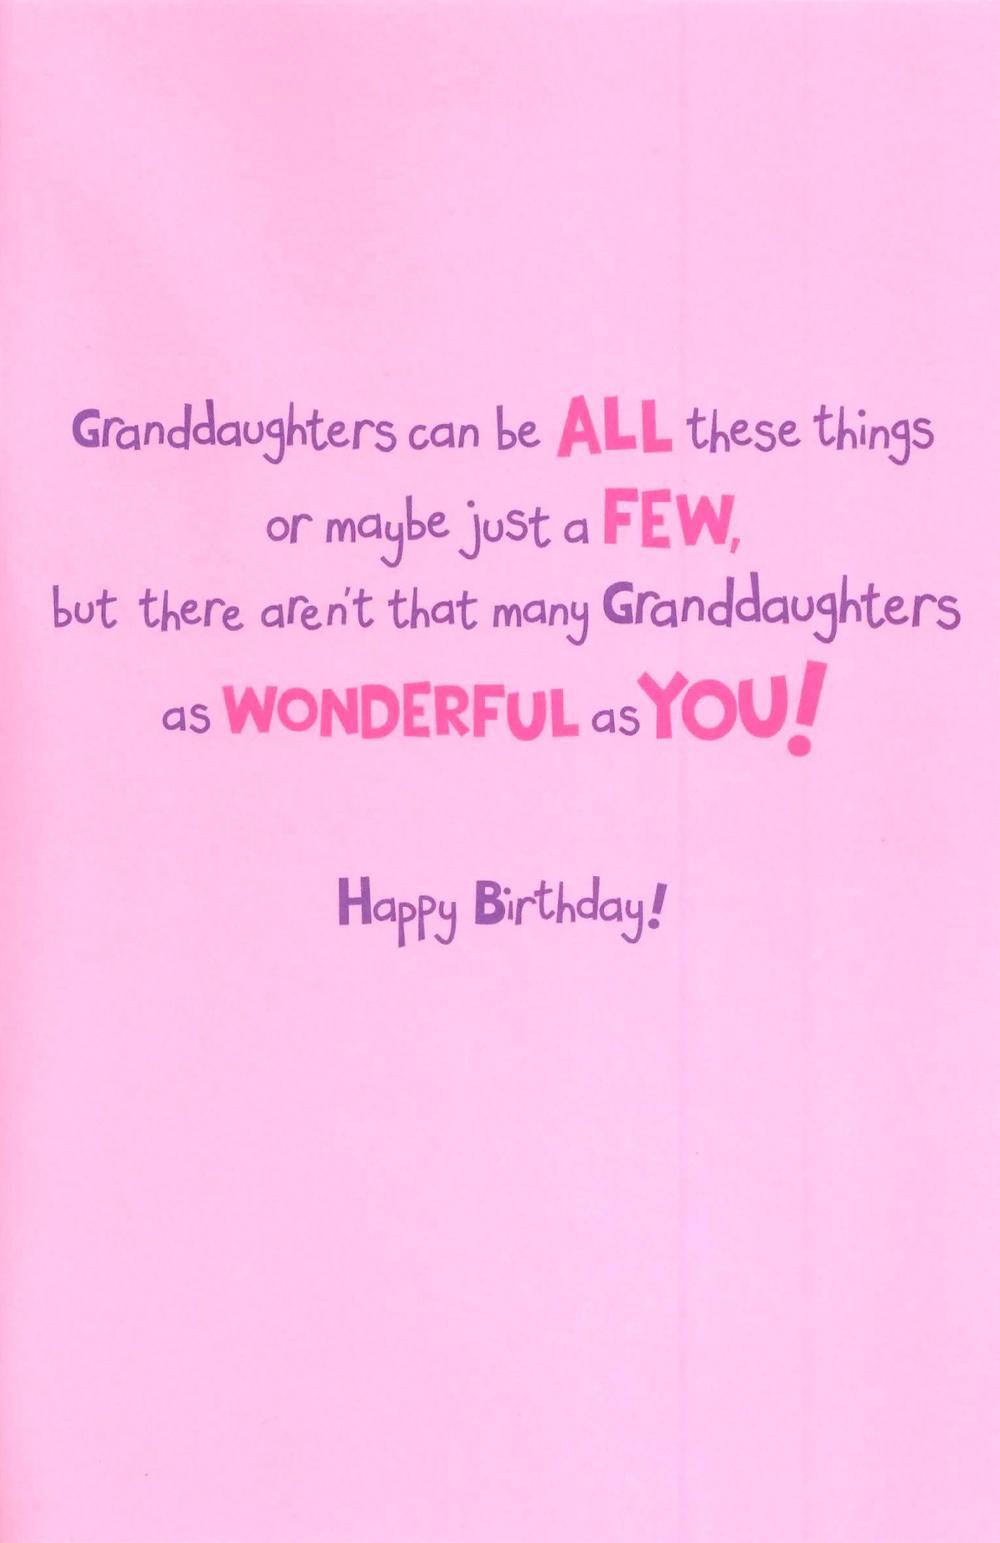 Cute Wonderful Granddaughter Birthday Greeting Card Thumbnail 1 2